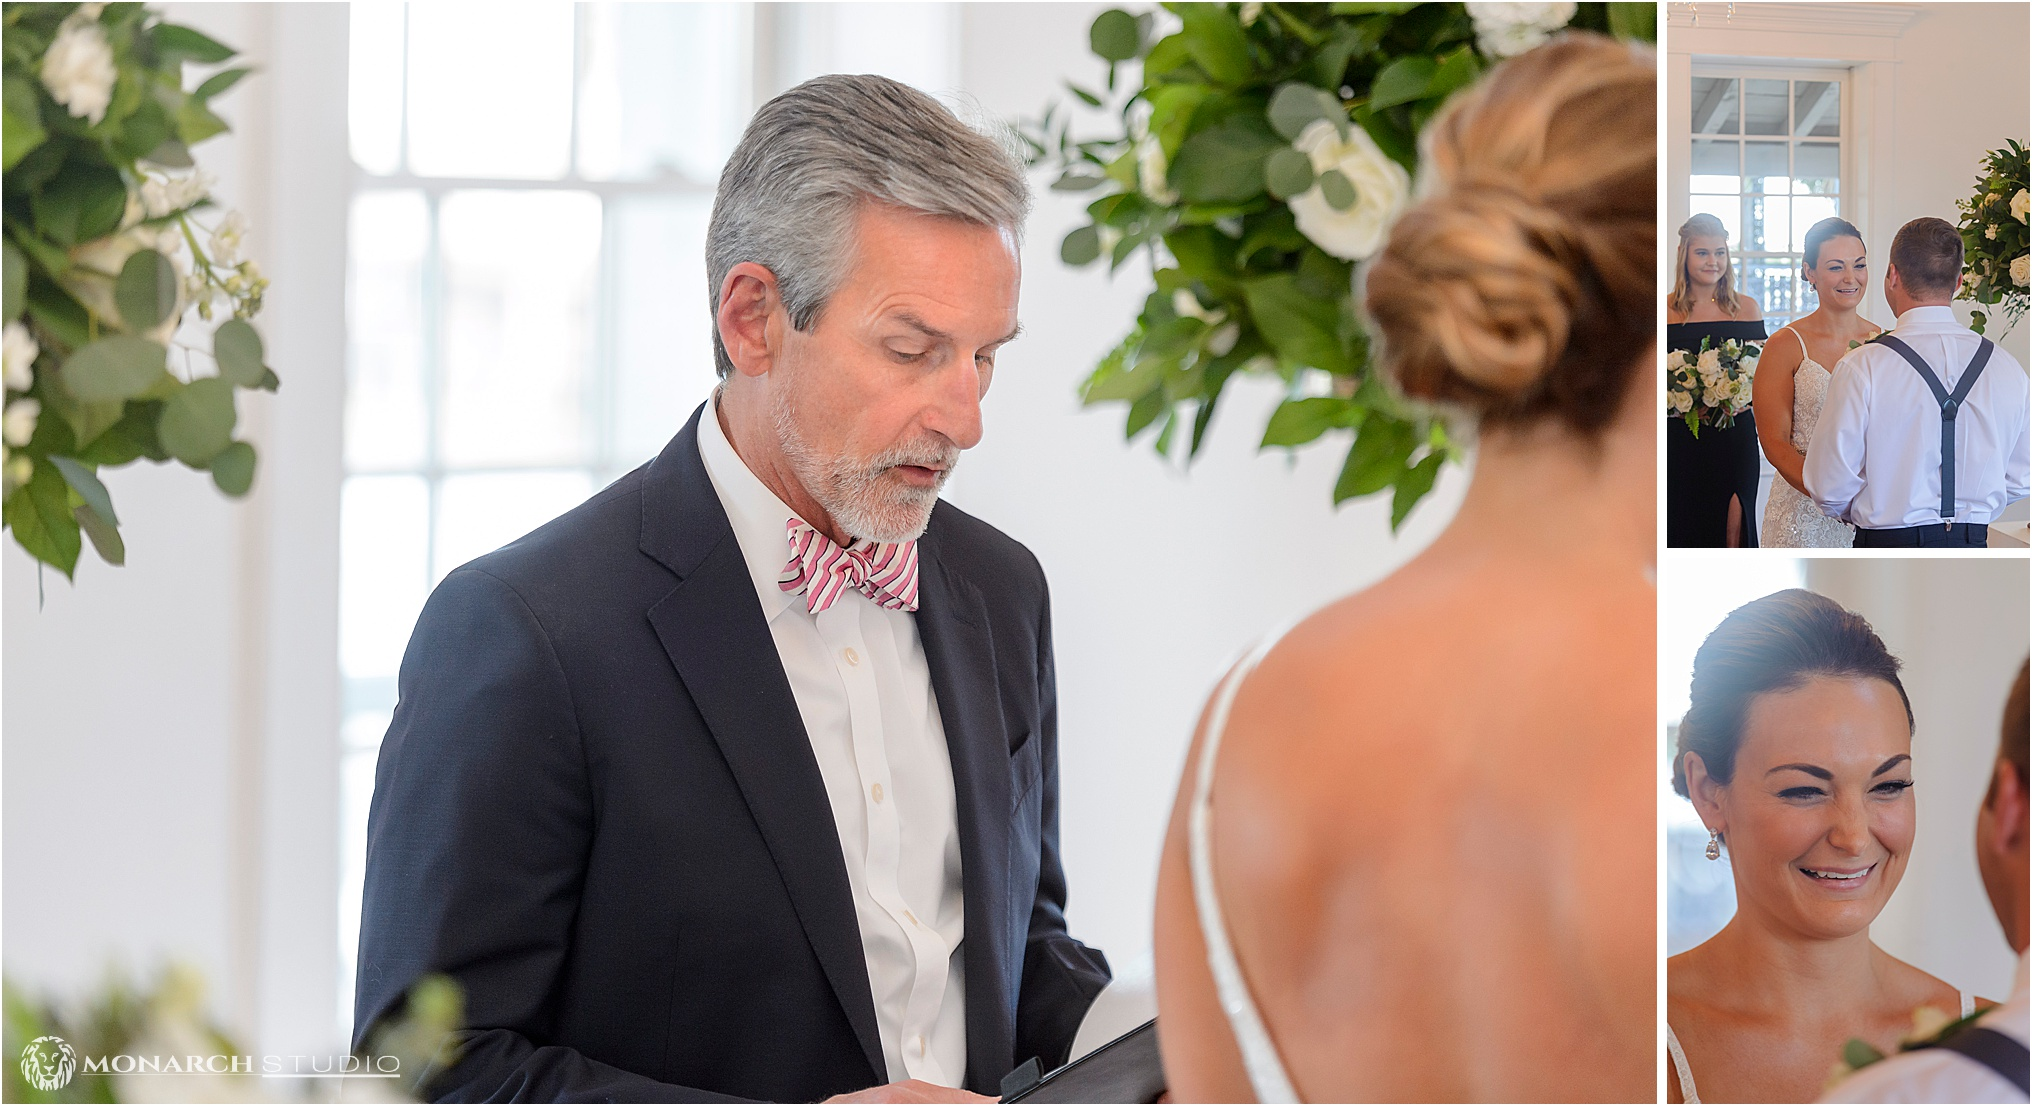 071-whiteroom-wedding-photographer-2019-05-22_0053.jpg